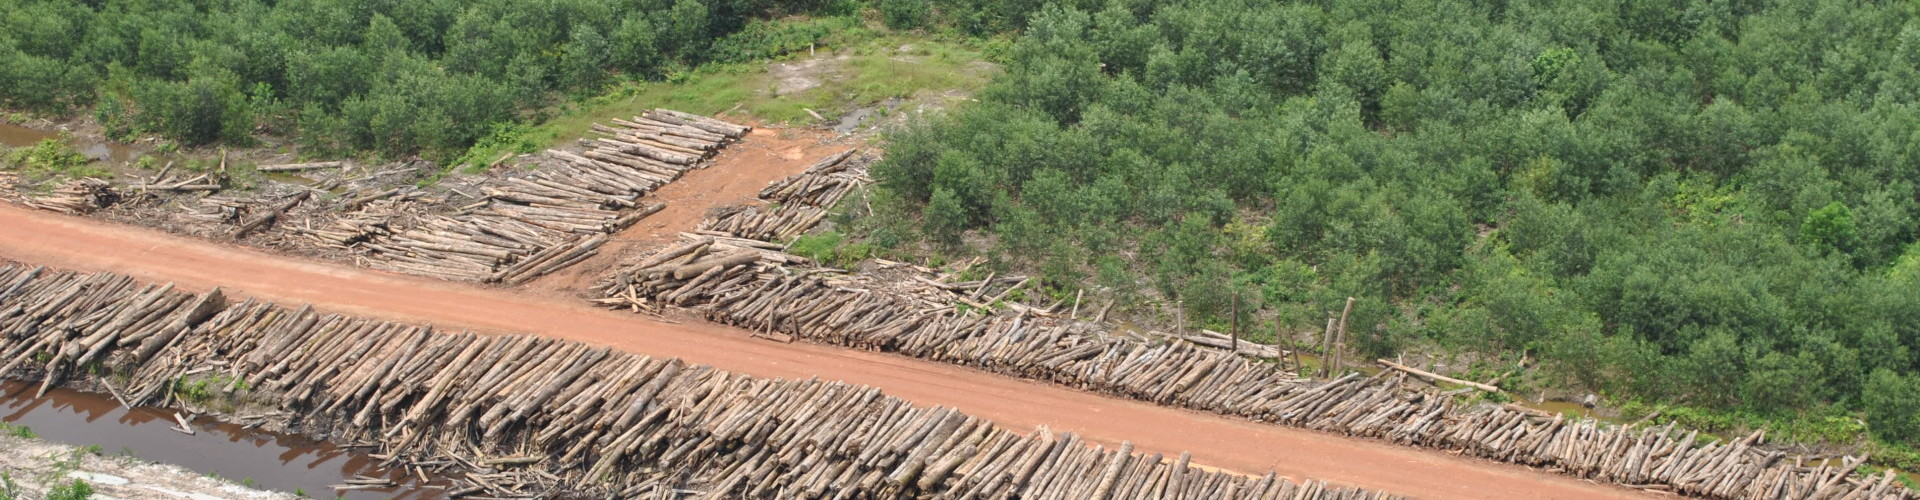 Logs, drainage chanel, Acacia plantation_Reza